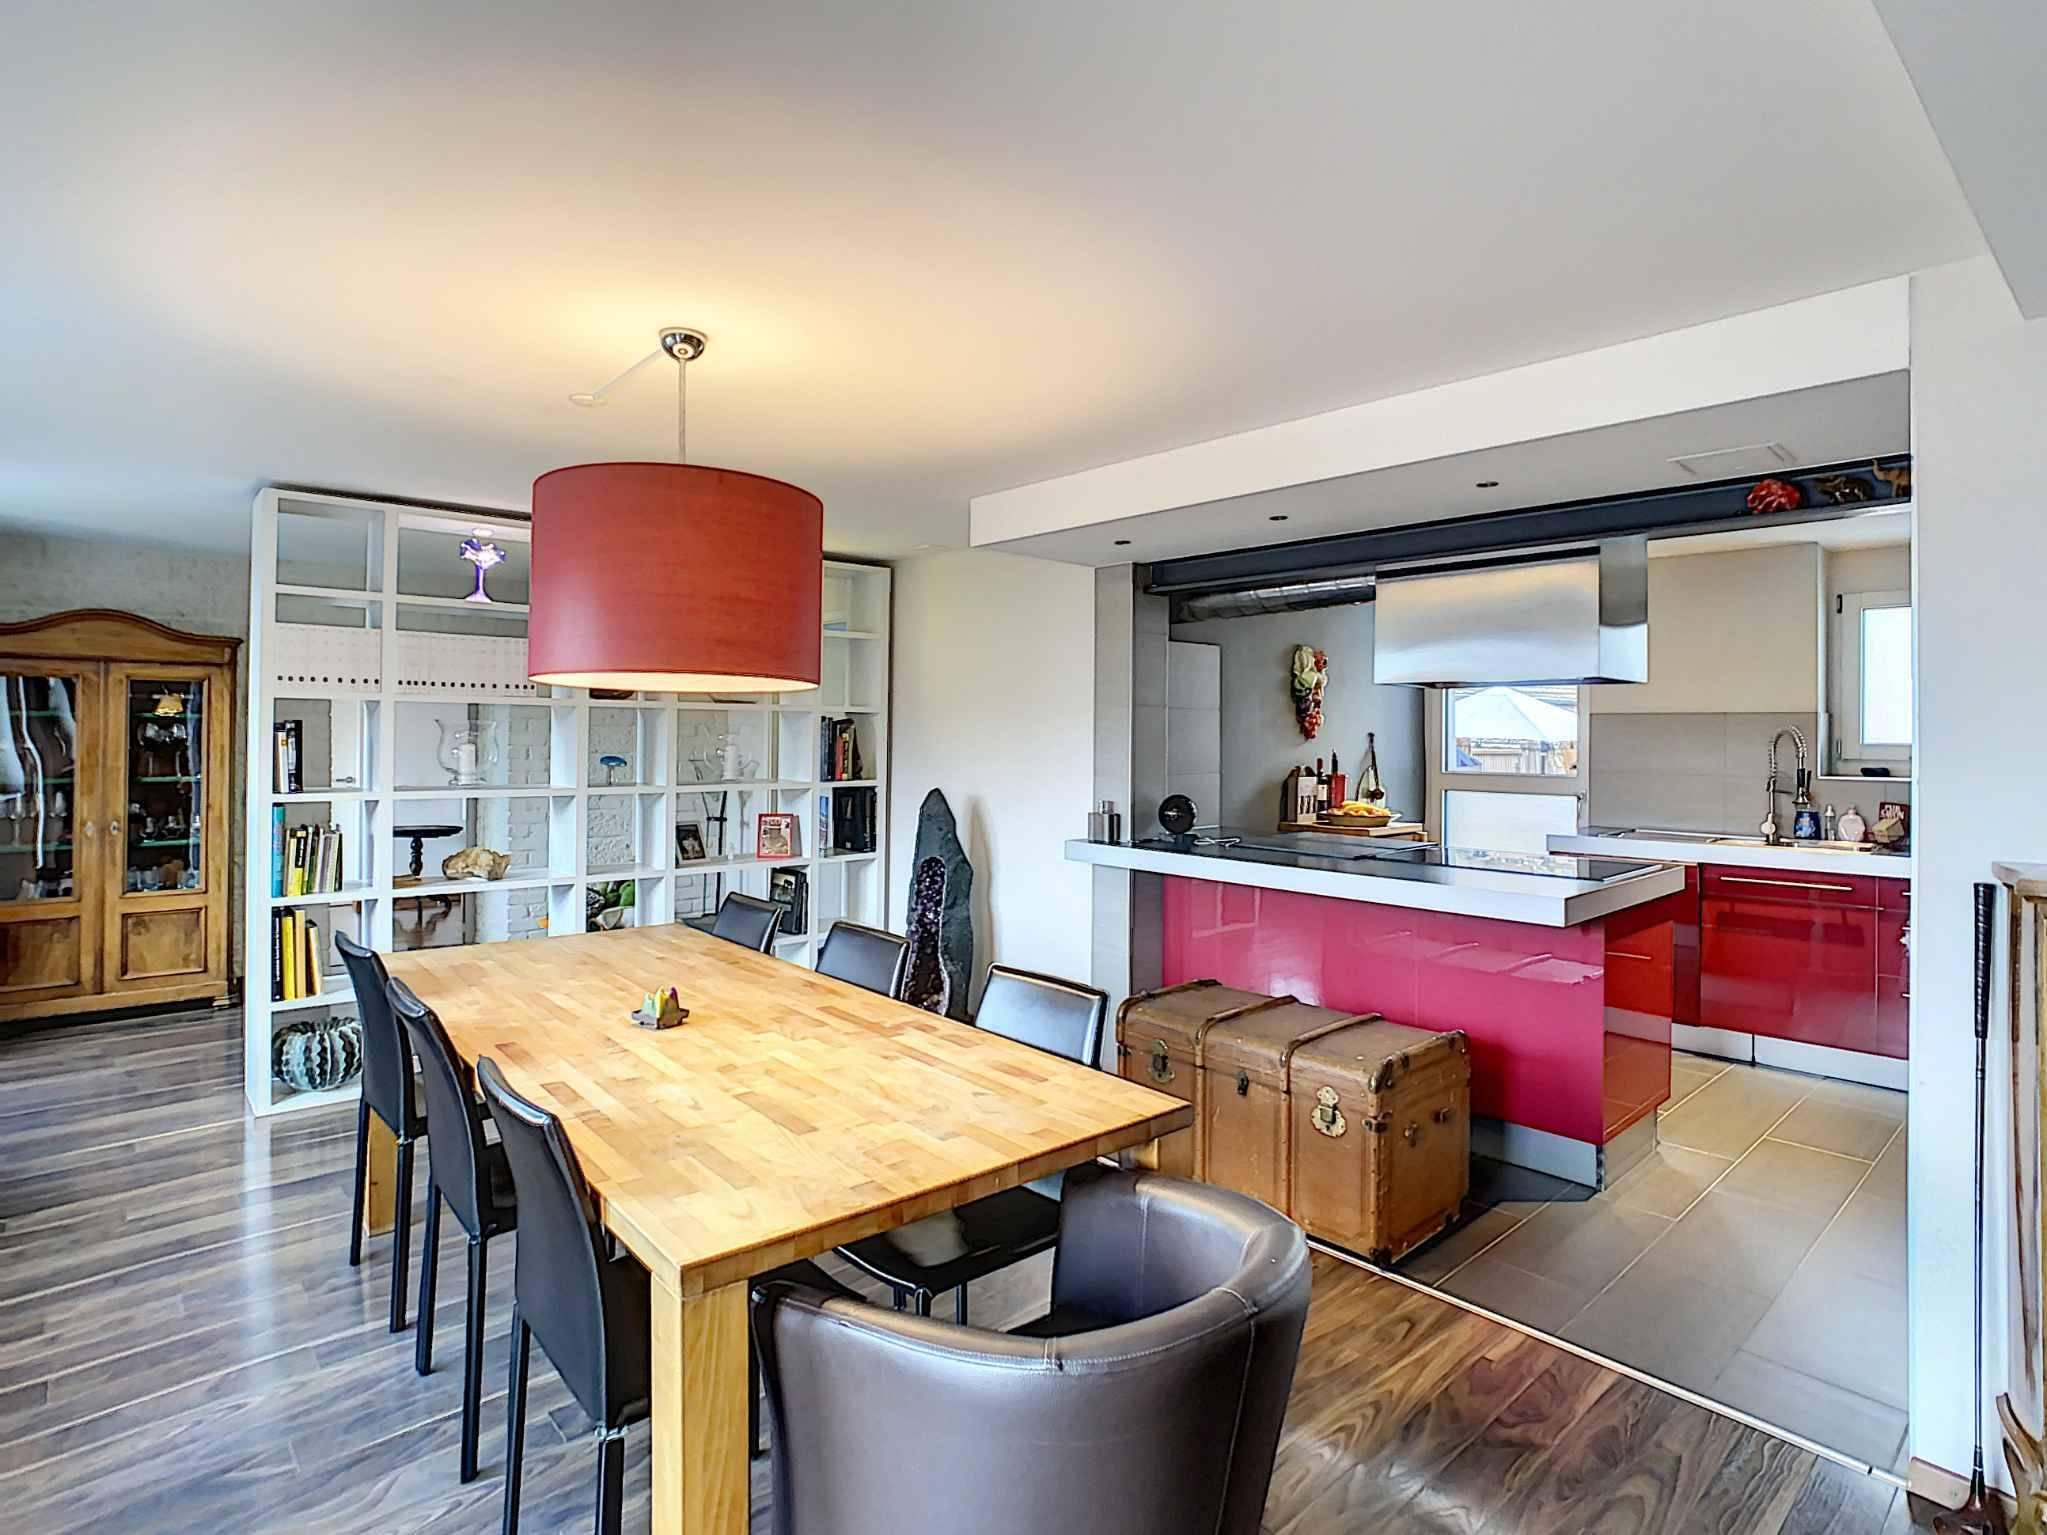 dining area inside Ruelle de Borjaux 12 in blonay vaud switzerland